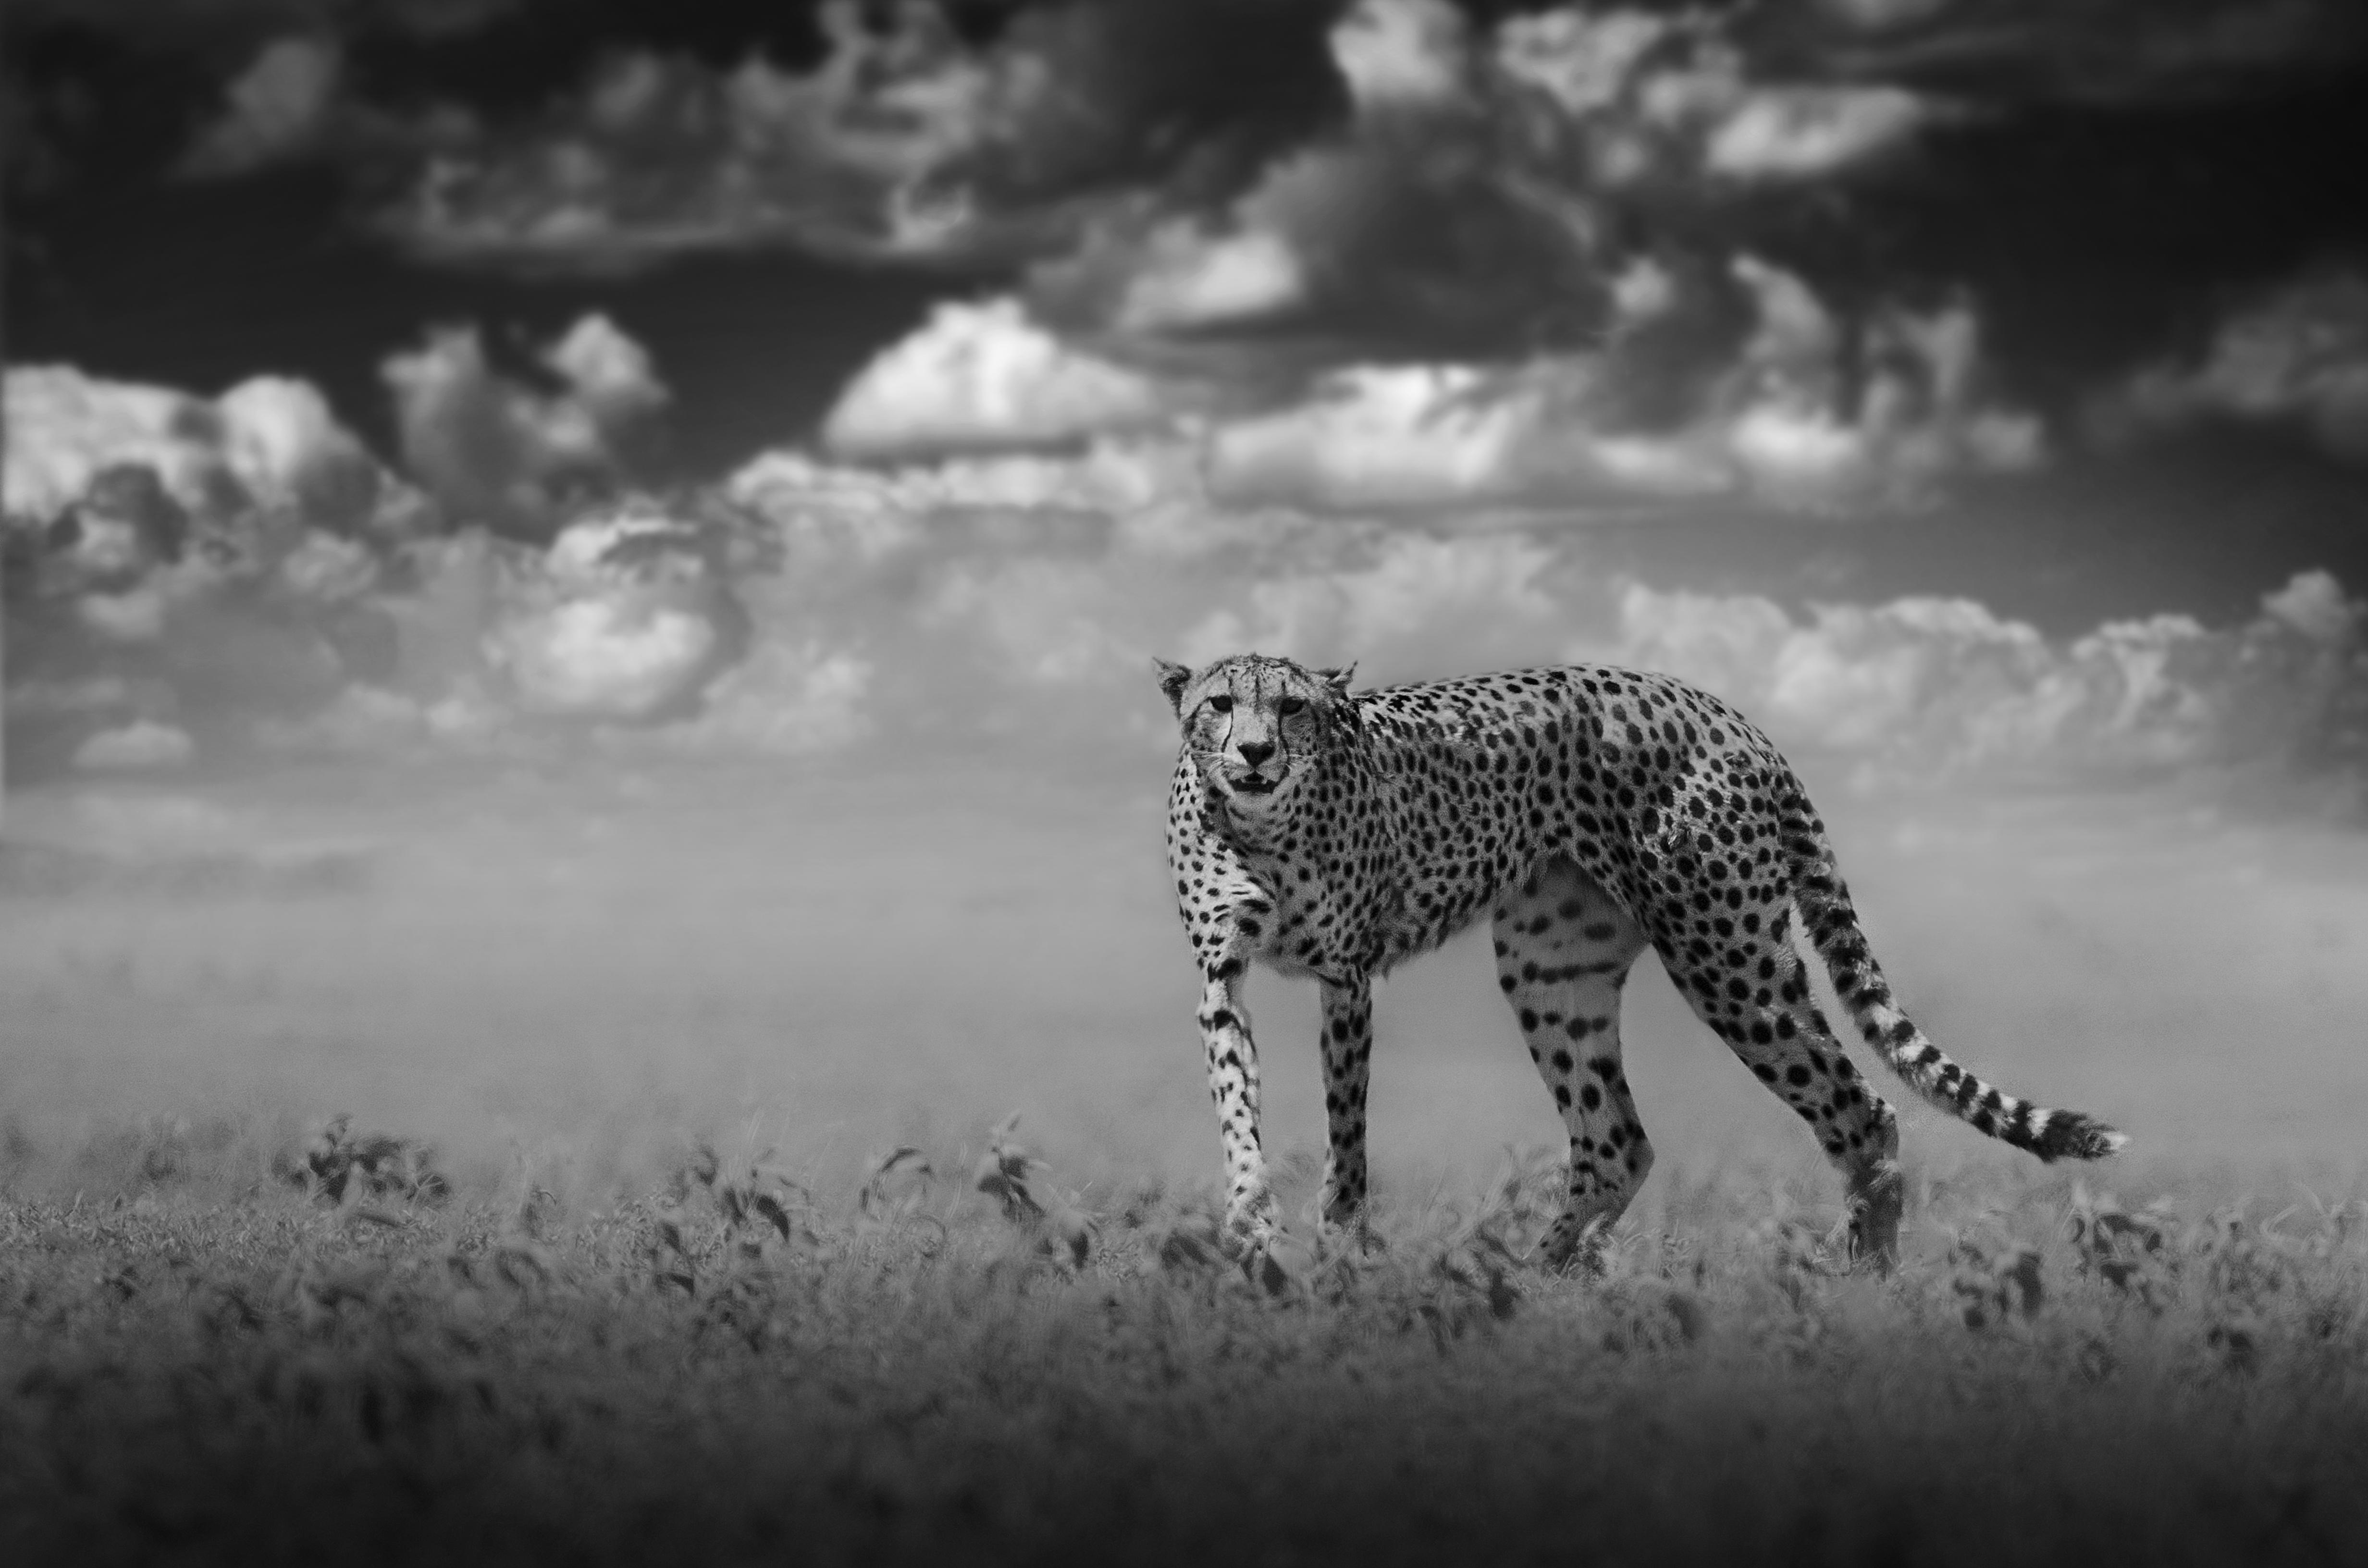 Wildlife art - Leopard